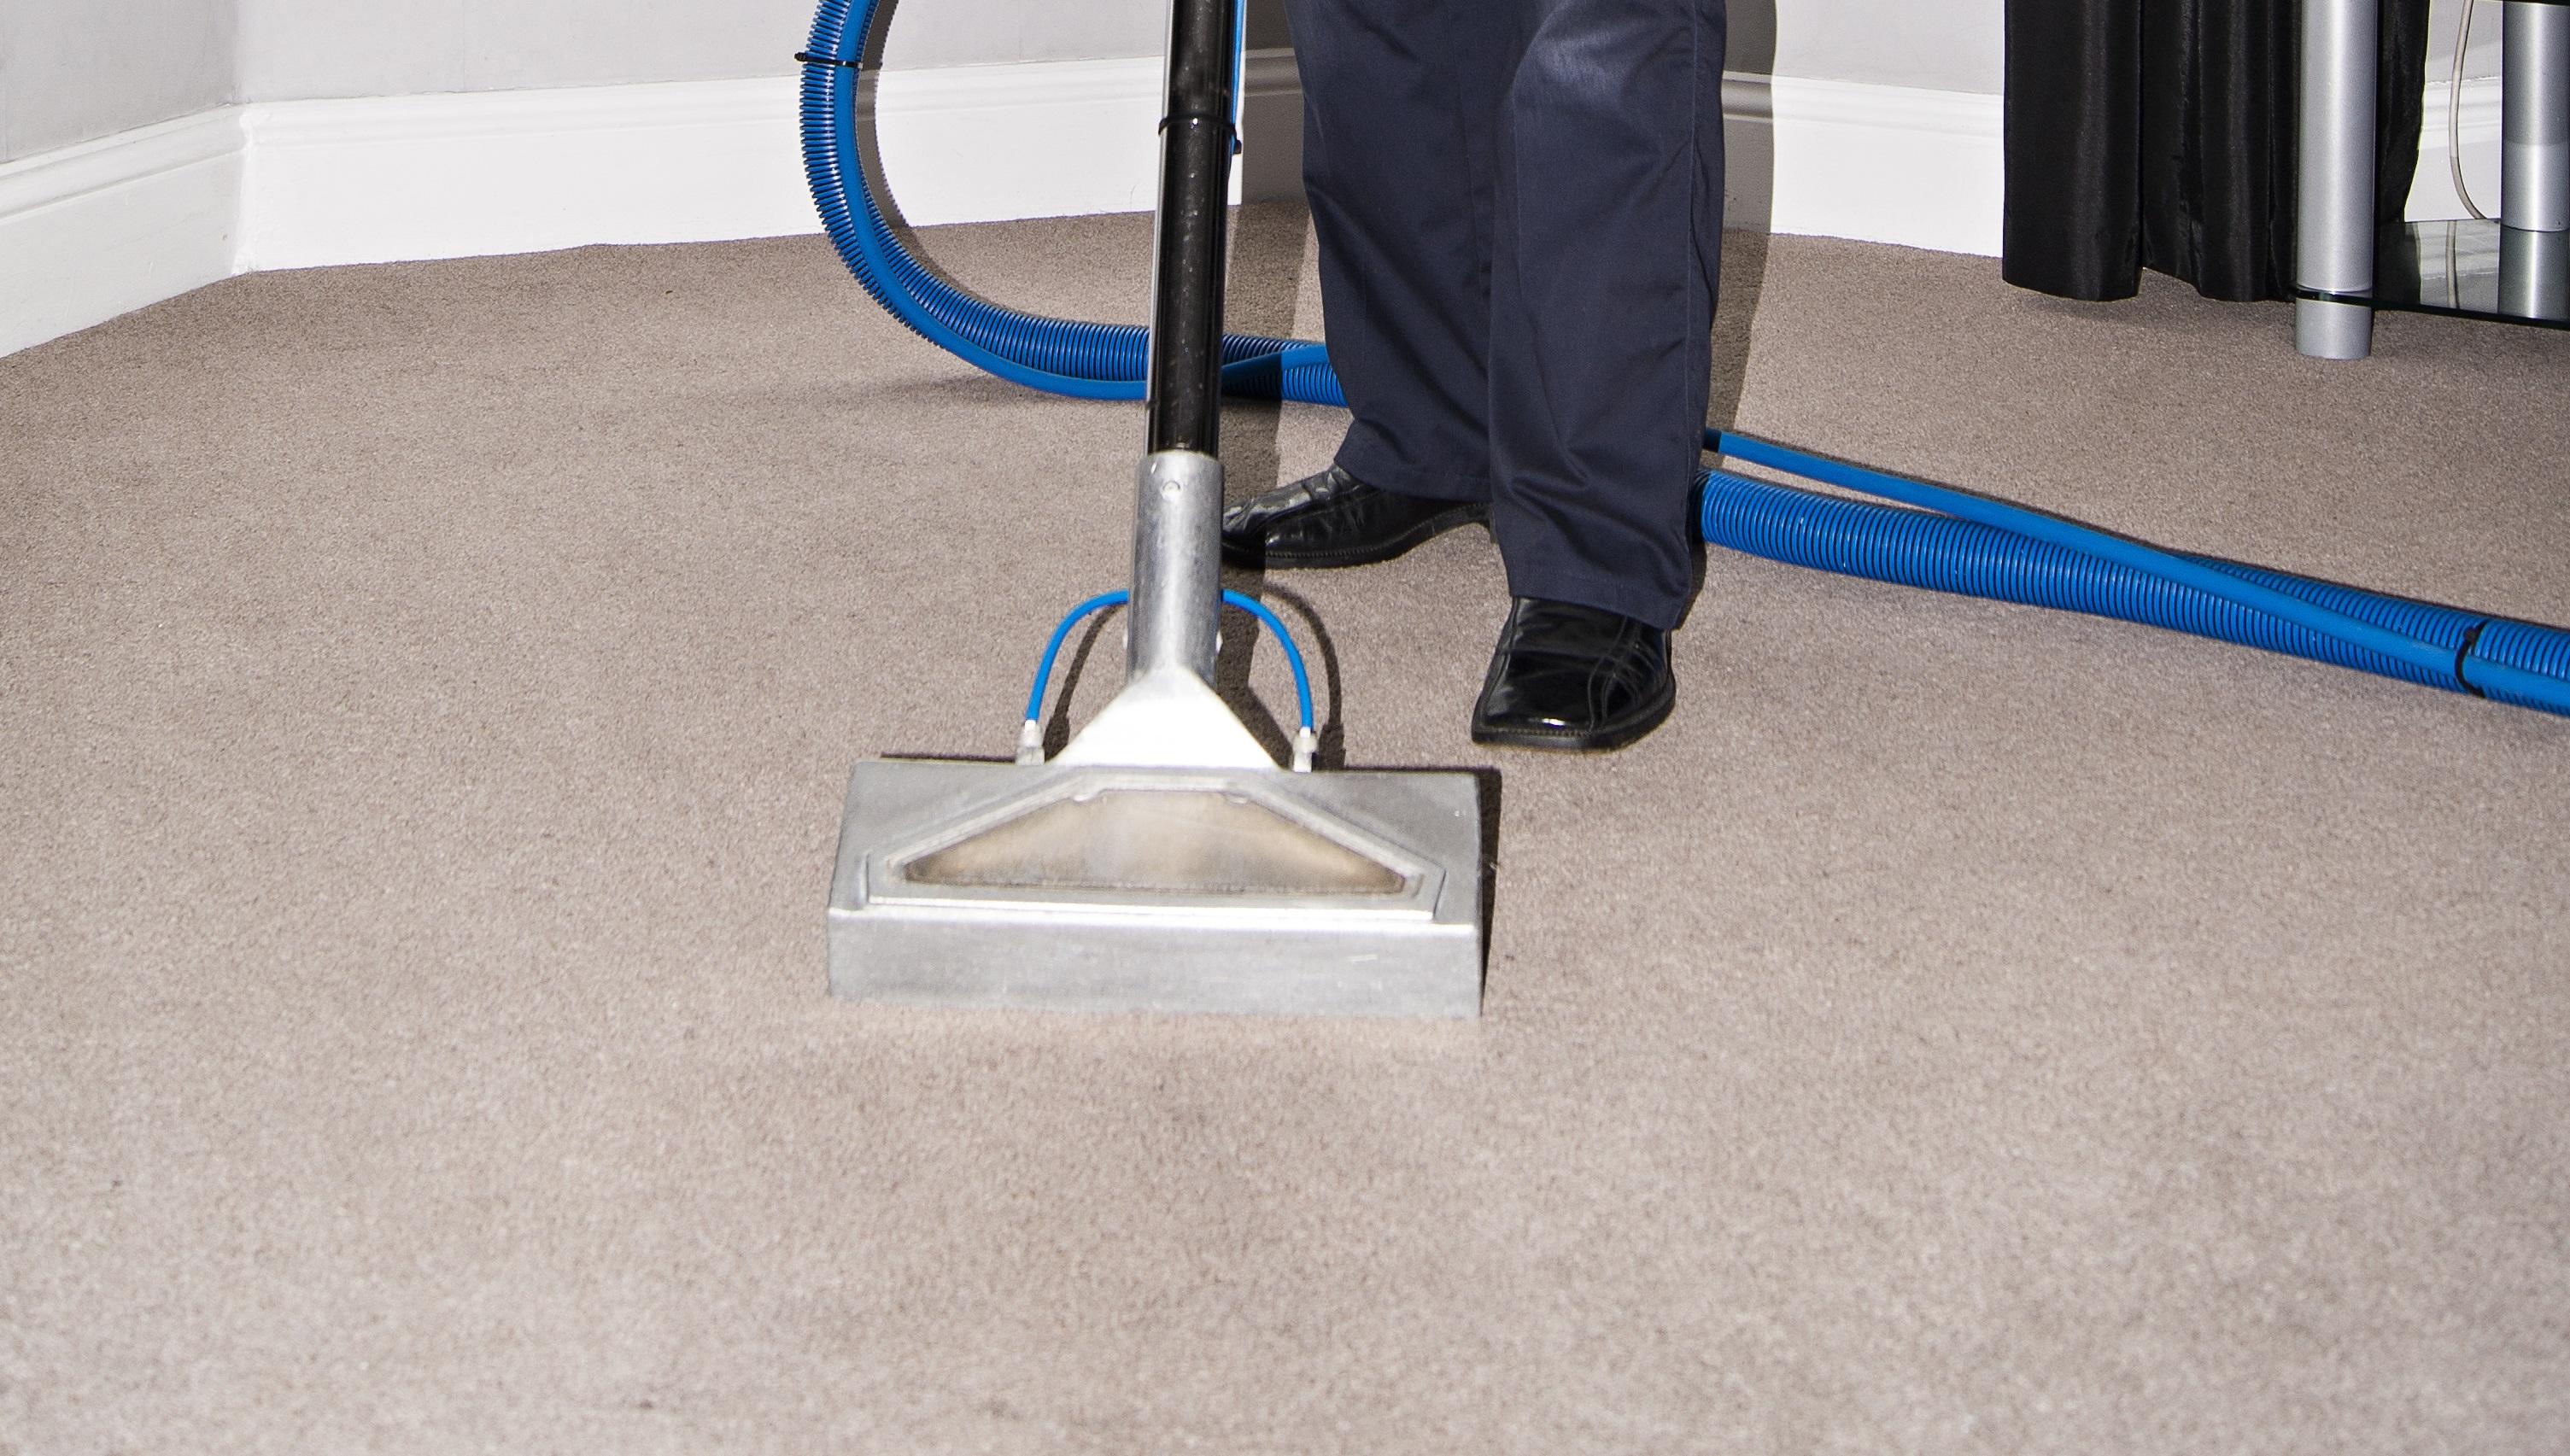 Dry Clean Carpet Powder Cfcpoland